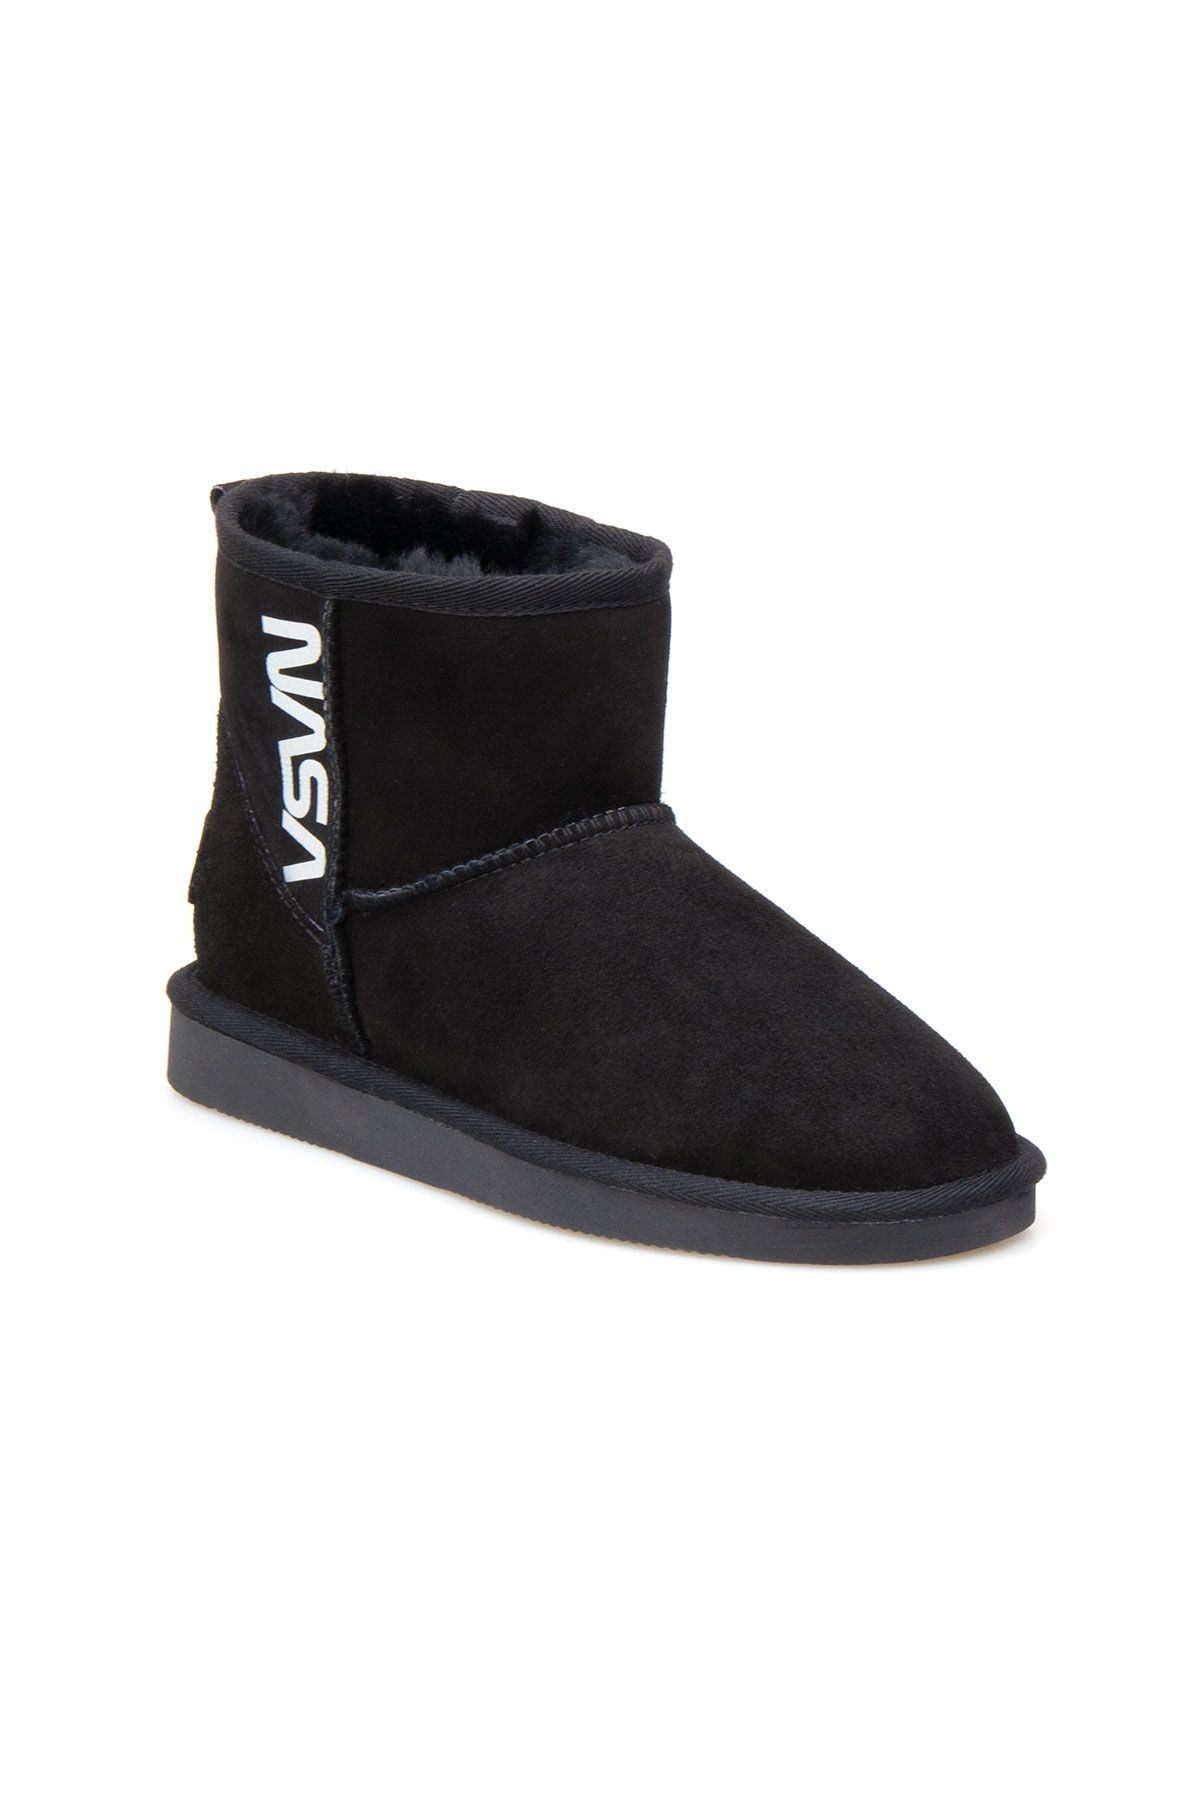 Pegia Genuine Sheepskin Women's Boots 191120 Black